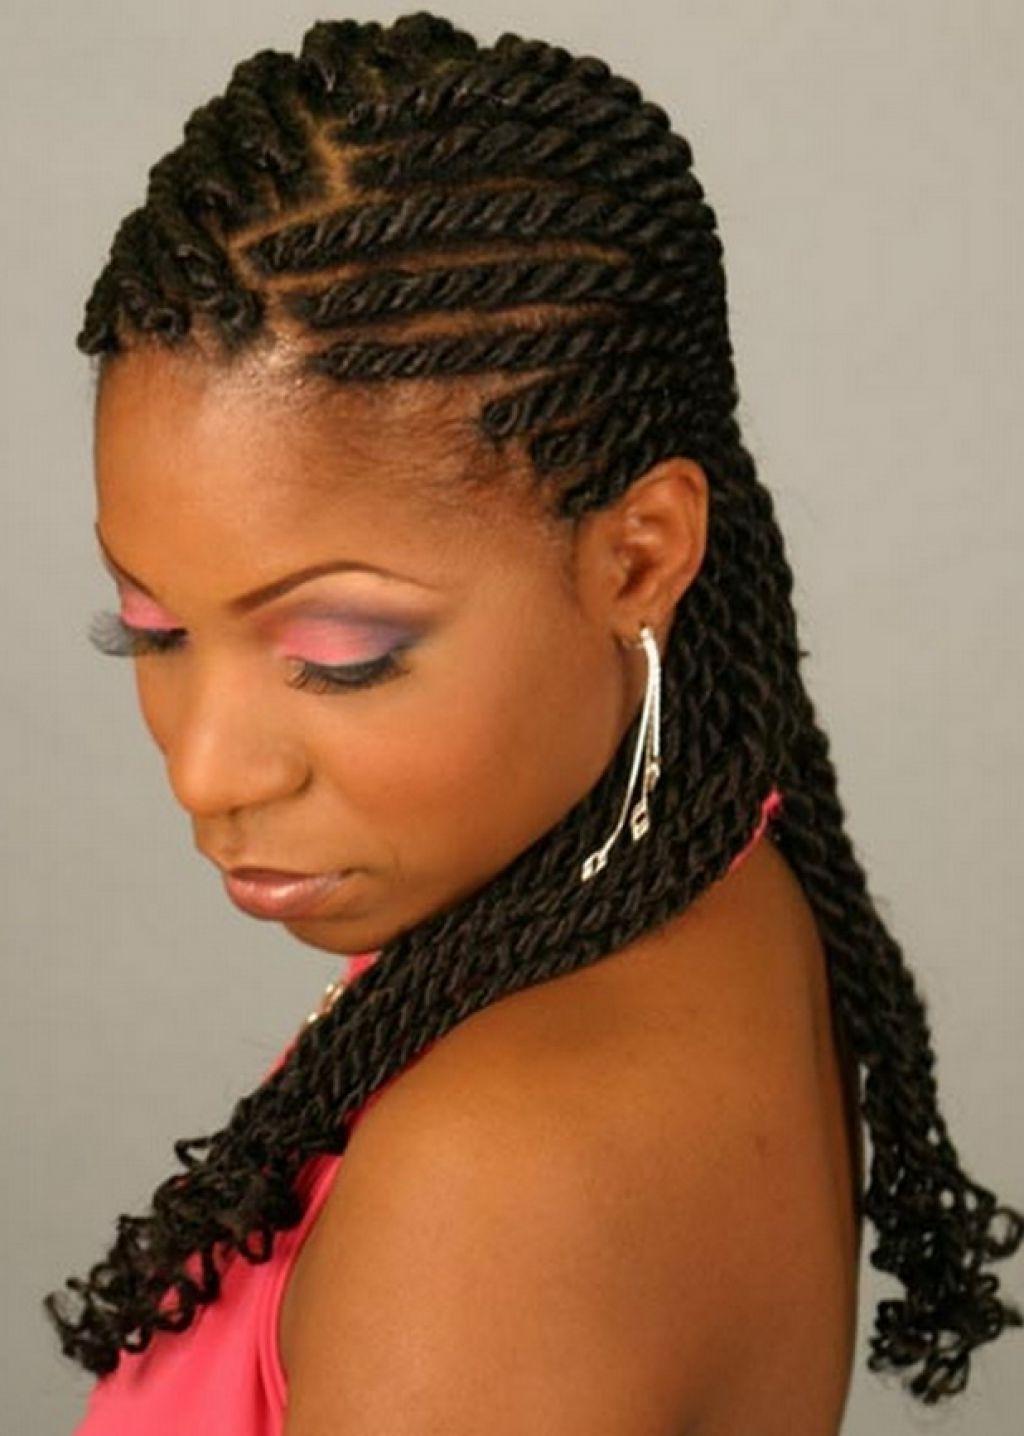 Hairstyleswithbraidsforblackwomenweaveponytailhairstyles